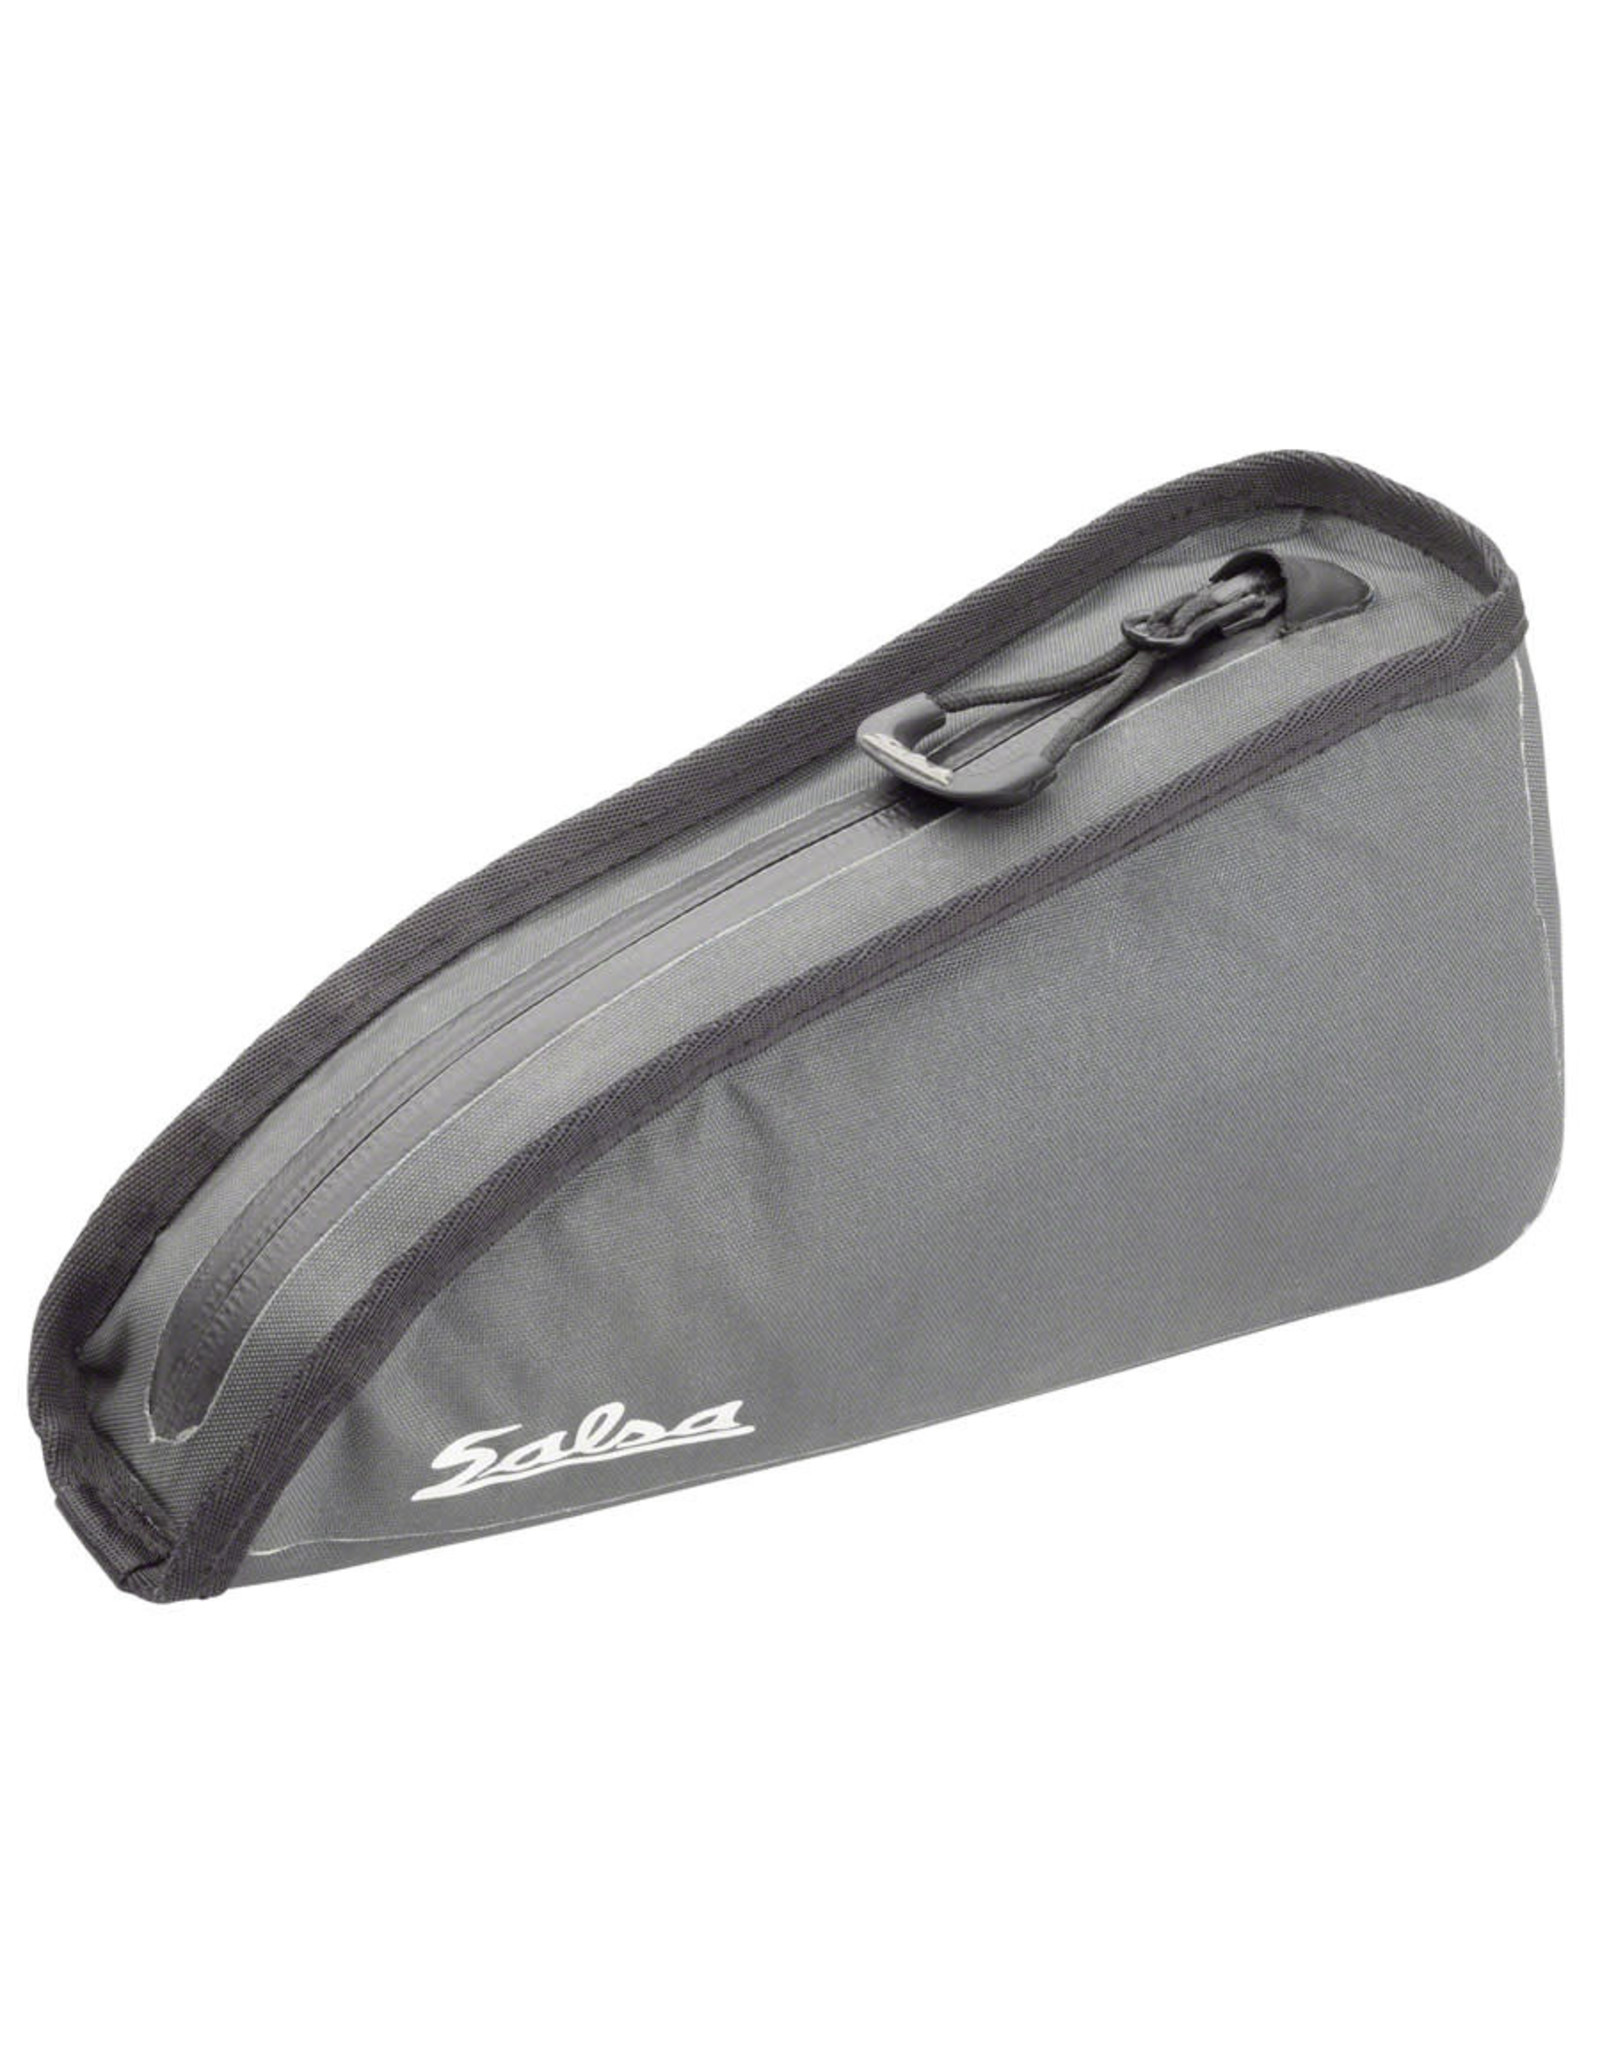 Salsa Salsa EXP Series Direct Mount Top Tube Bag